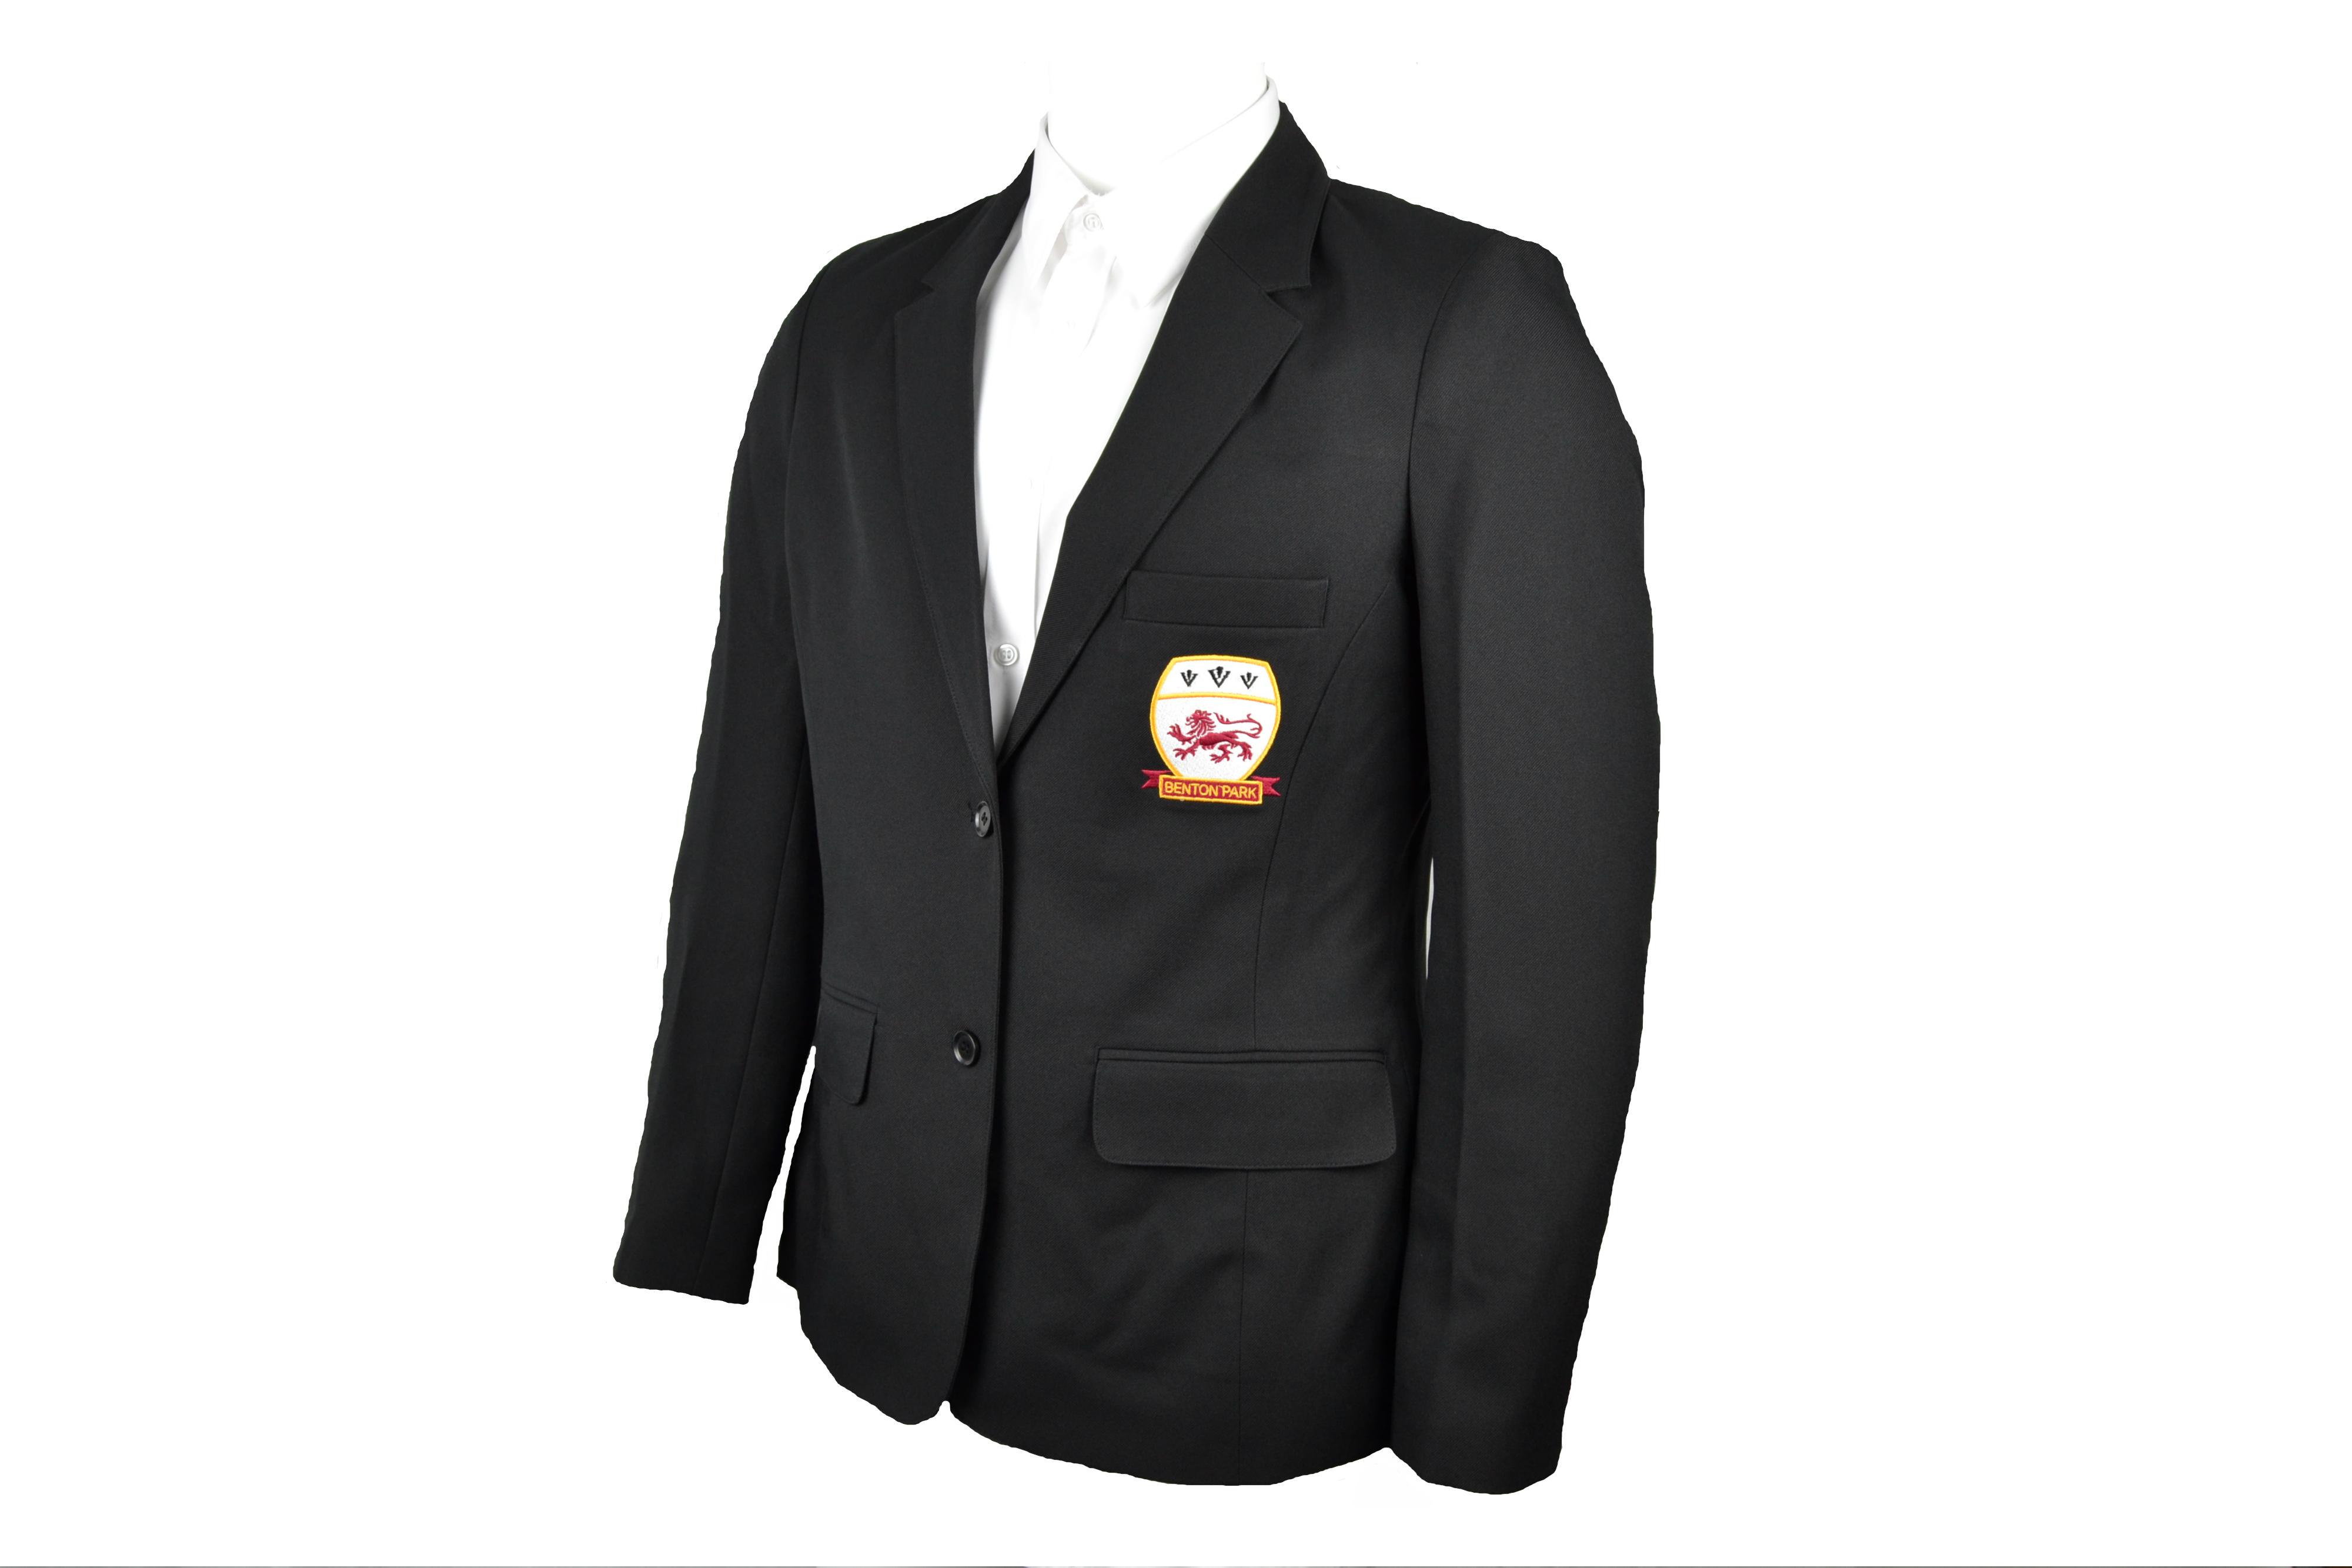 4b0a822e3 Benton Park Girls Blazer - Whittakers School Wear